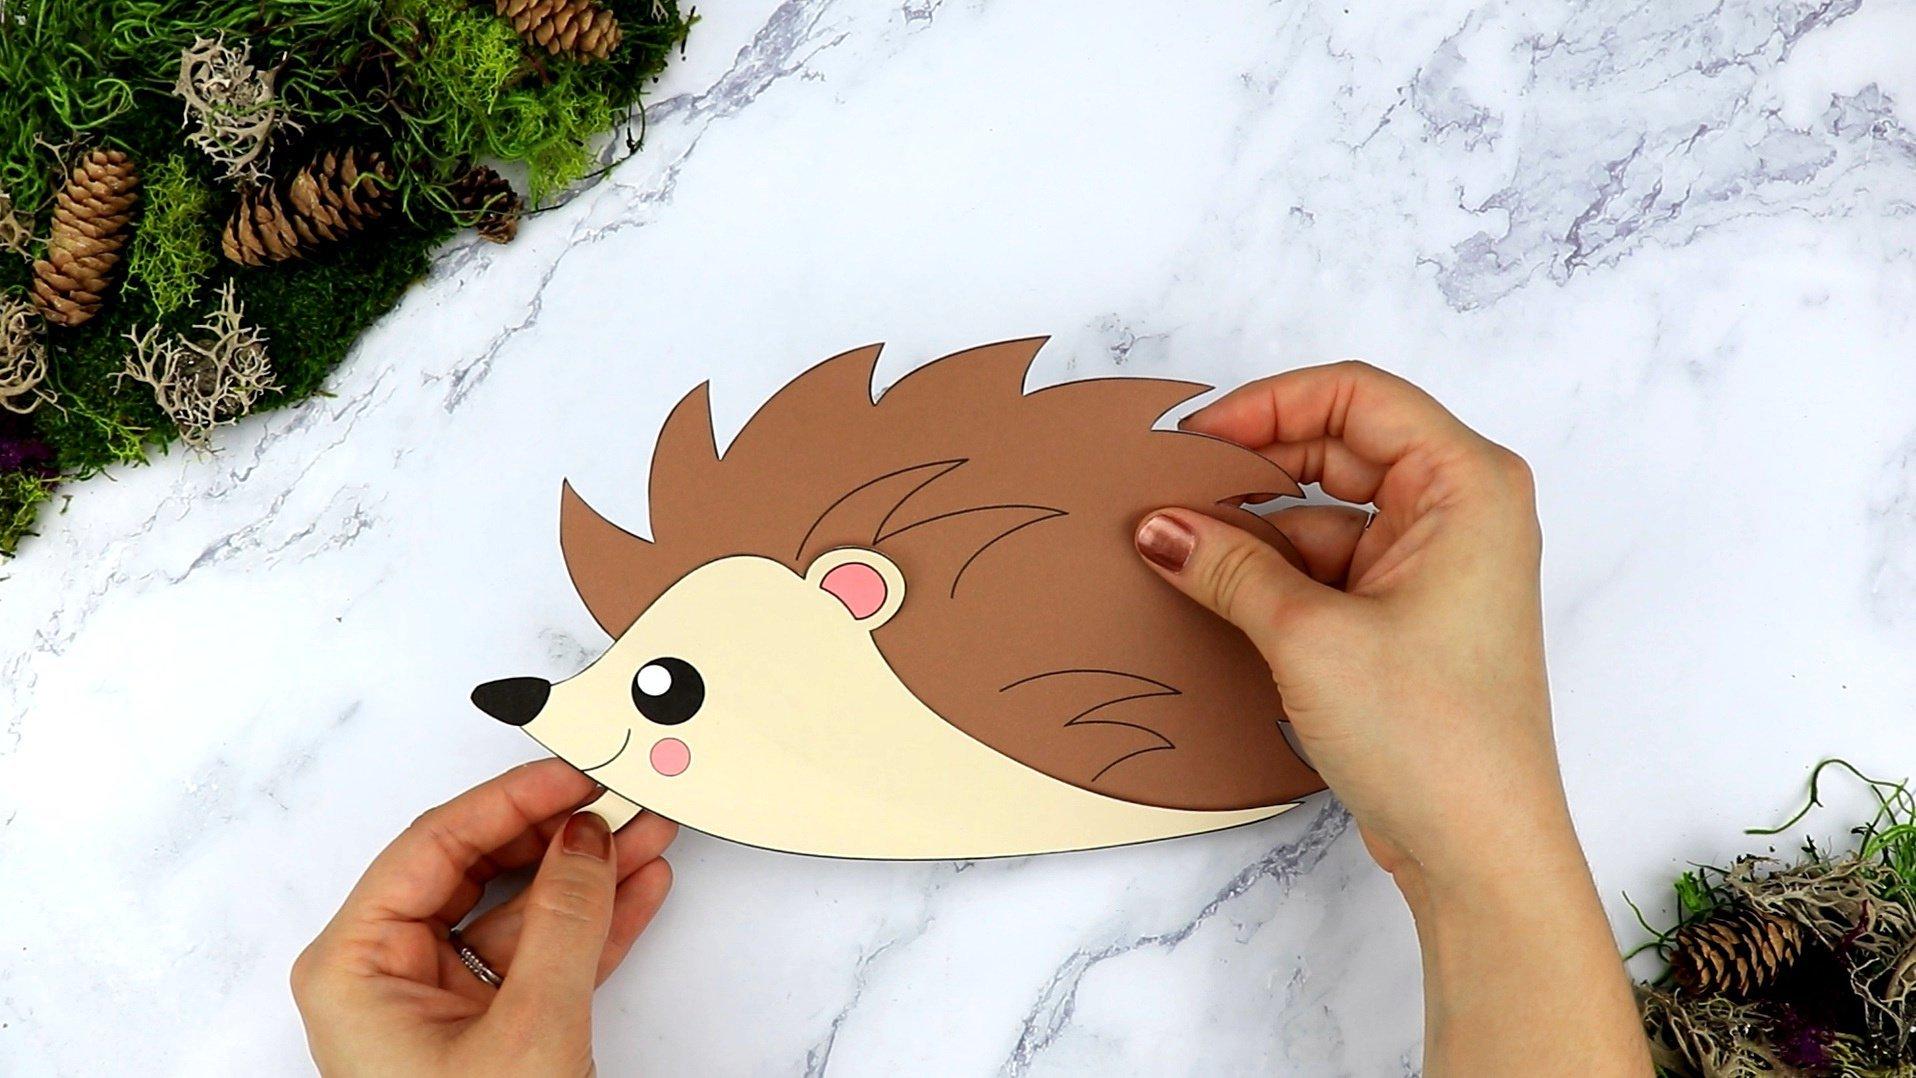 Free Printable Forest Hedgehog Craft Template for kids, preschoolers, toddlers and kindergartners